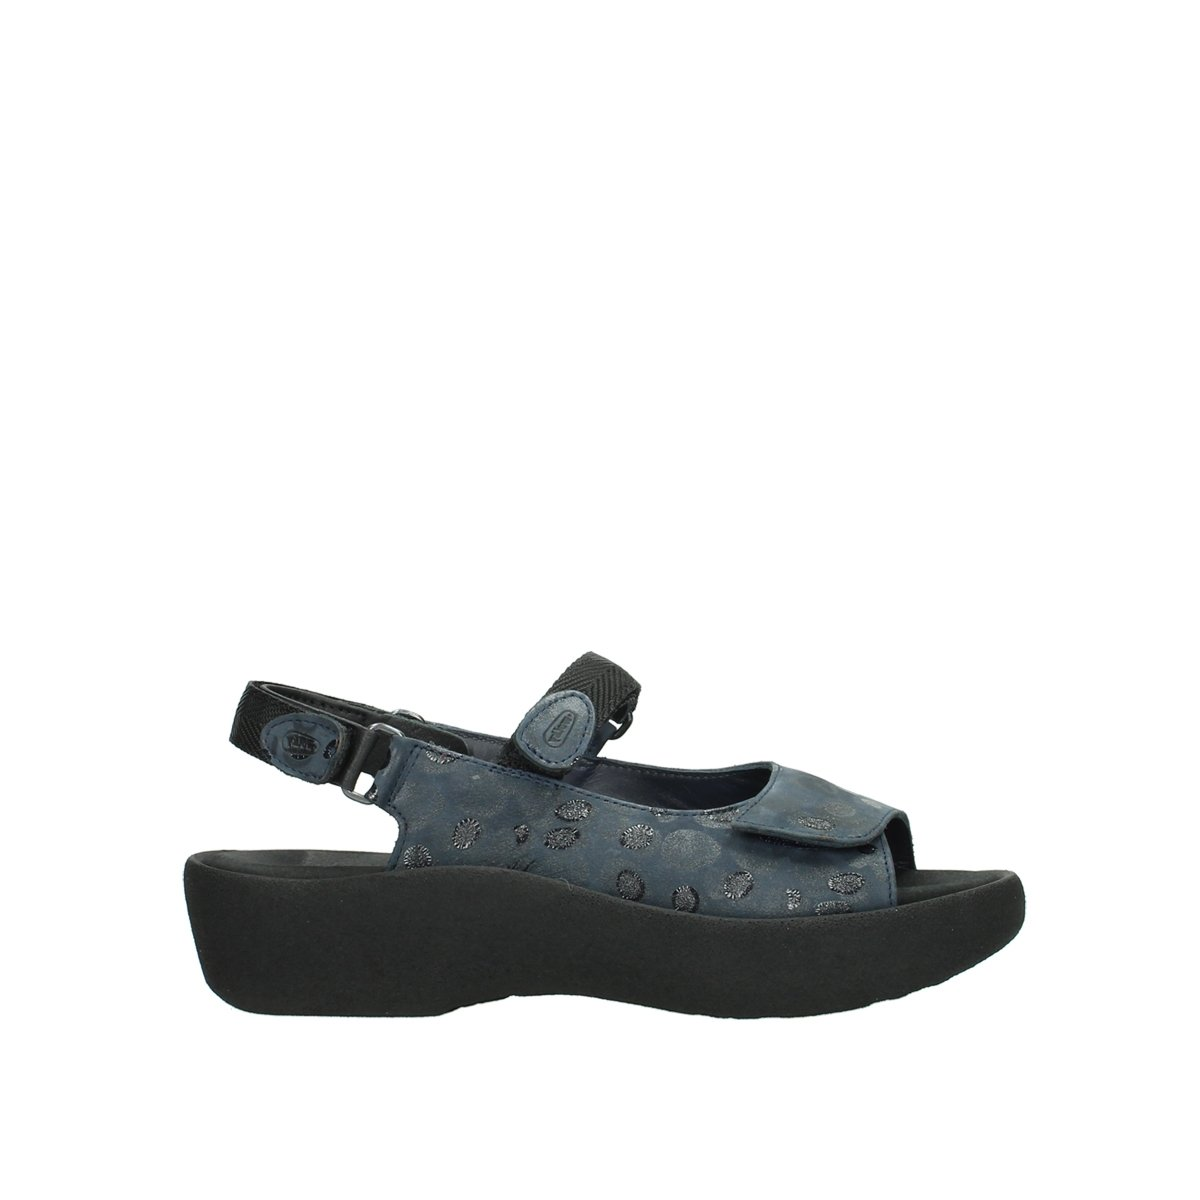 Wolky Comfort Jewel B079YJP56N 42 M EU|12800 Blue Nubuckleather